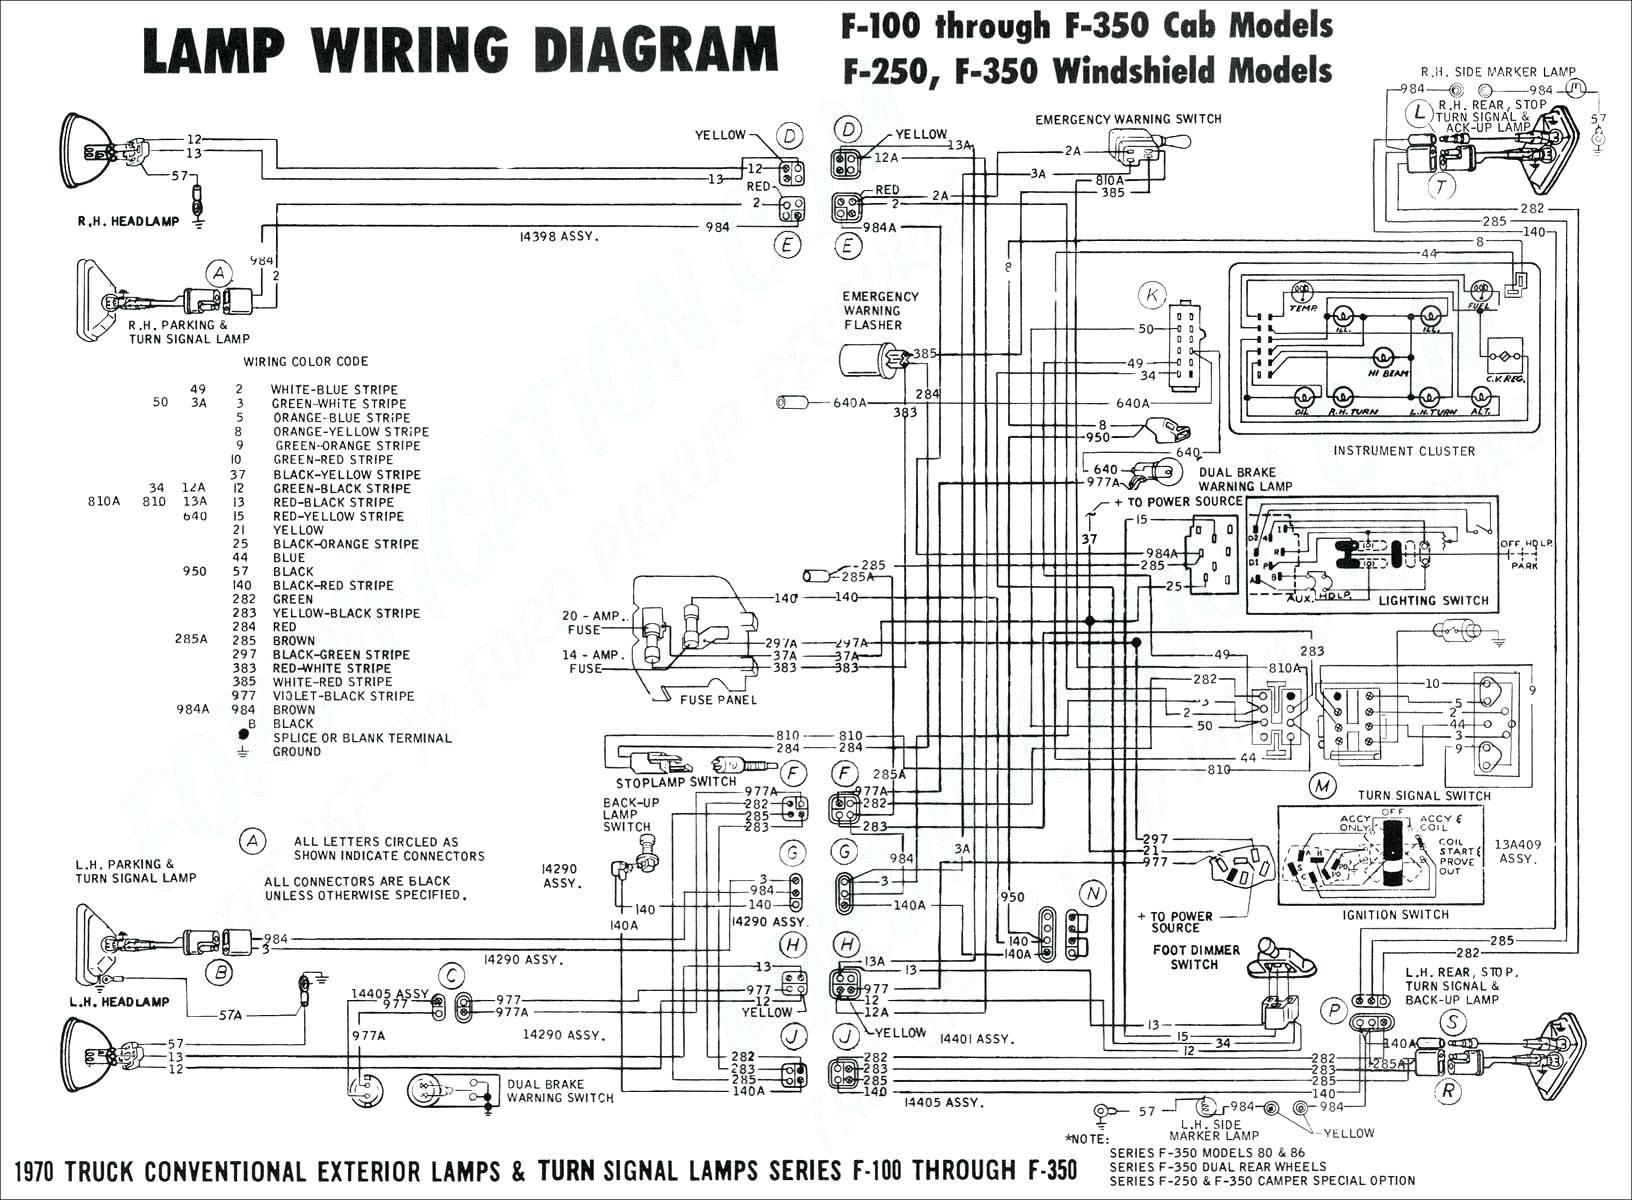 Xbox 360 Psu Wiring Diagram